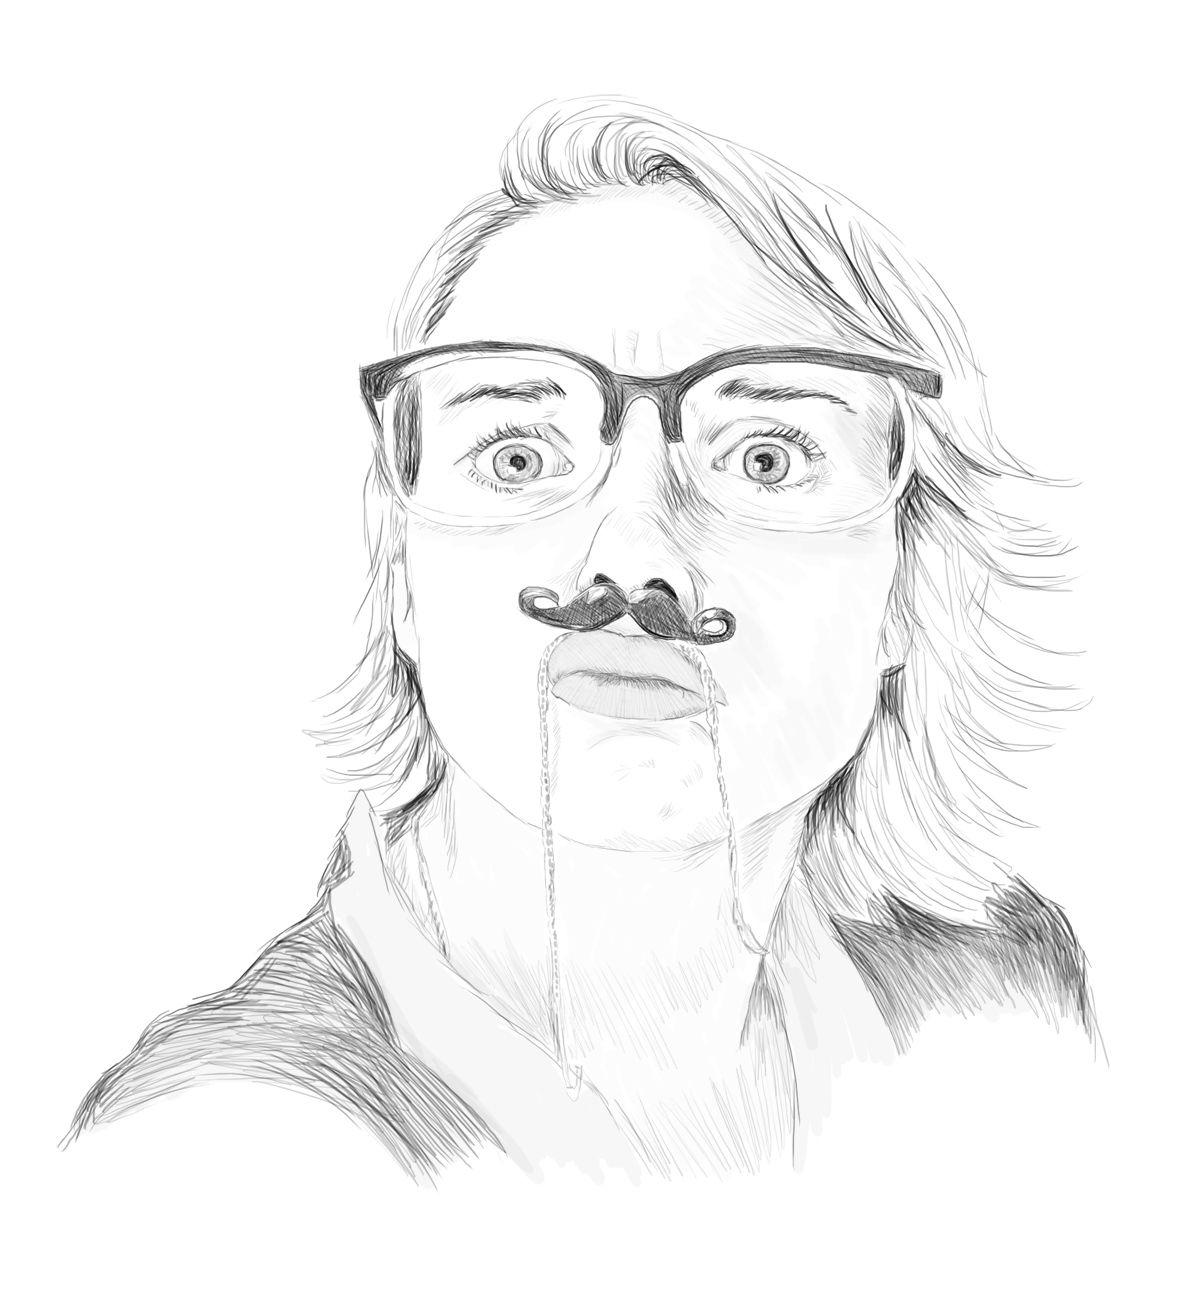 a silly self-portrait http://samanthaeynon.com